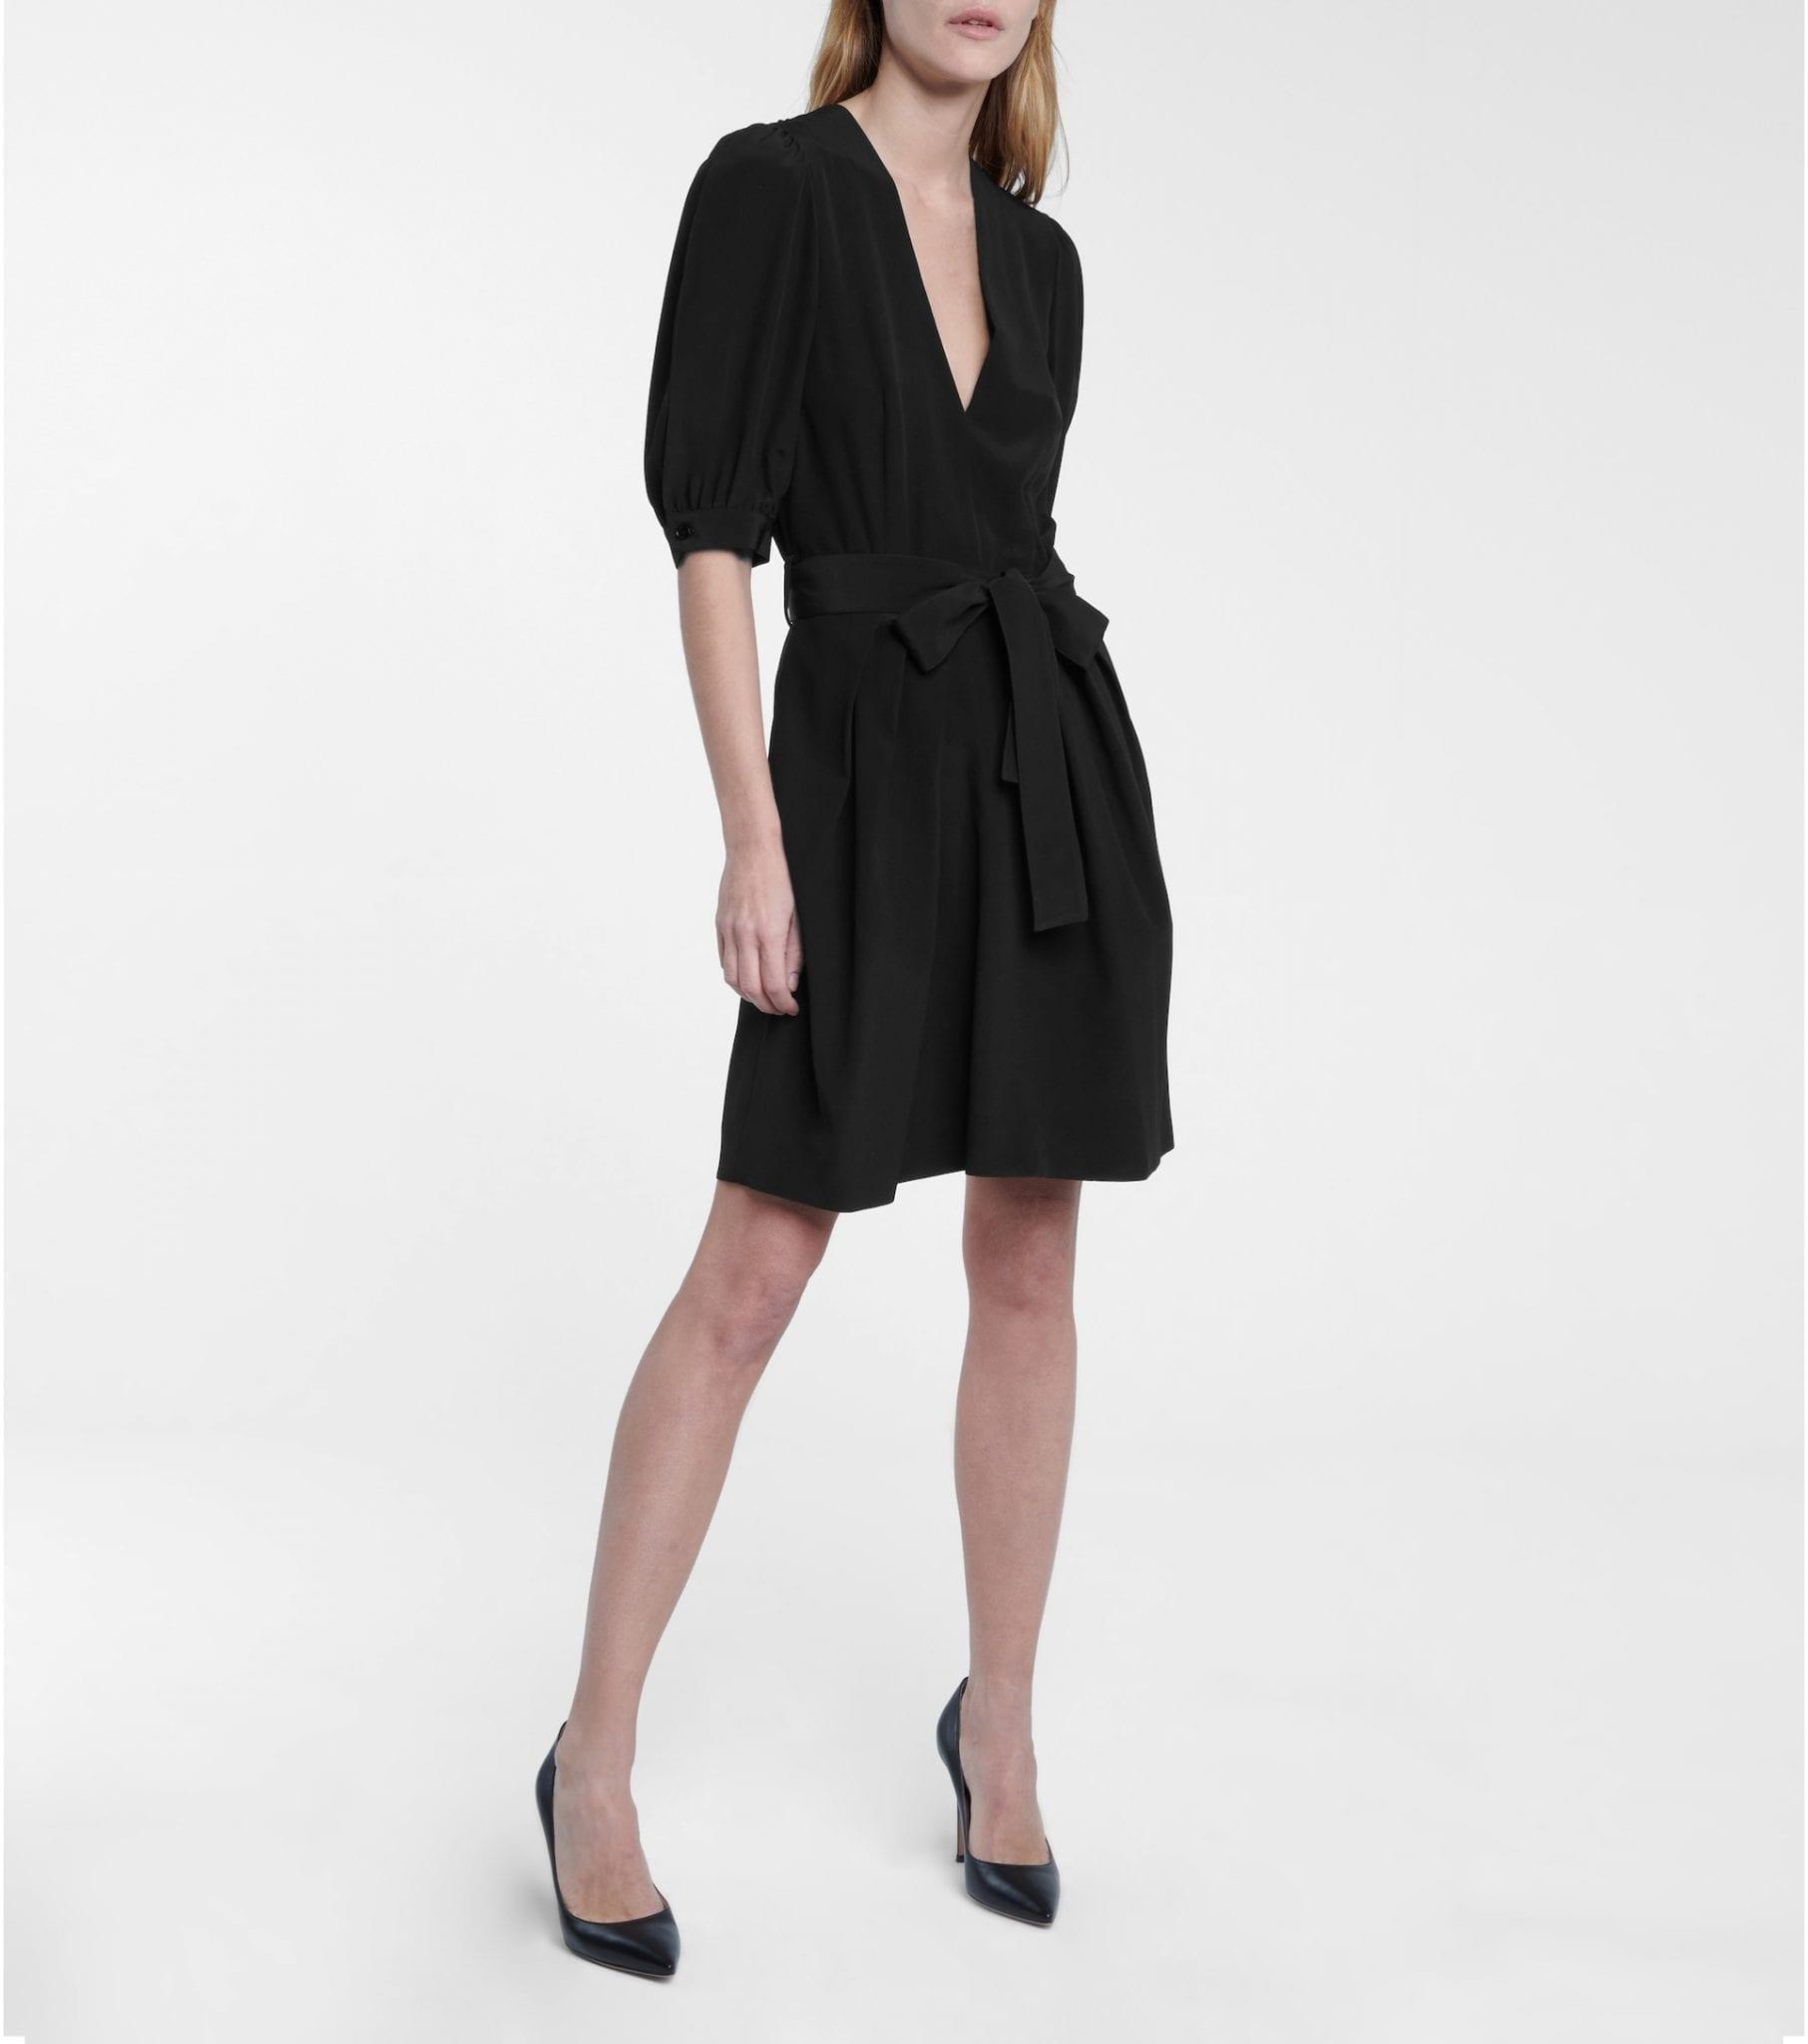 STELLA MCCARTNEY Jordan Silk Mini Dress